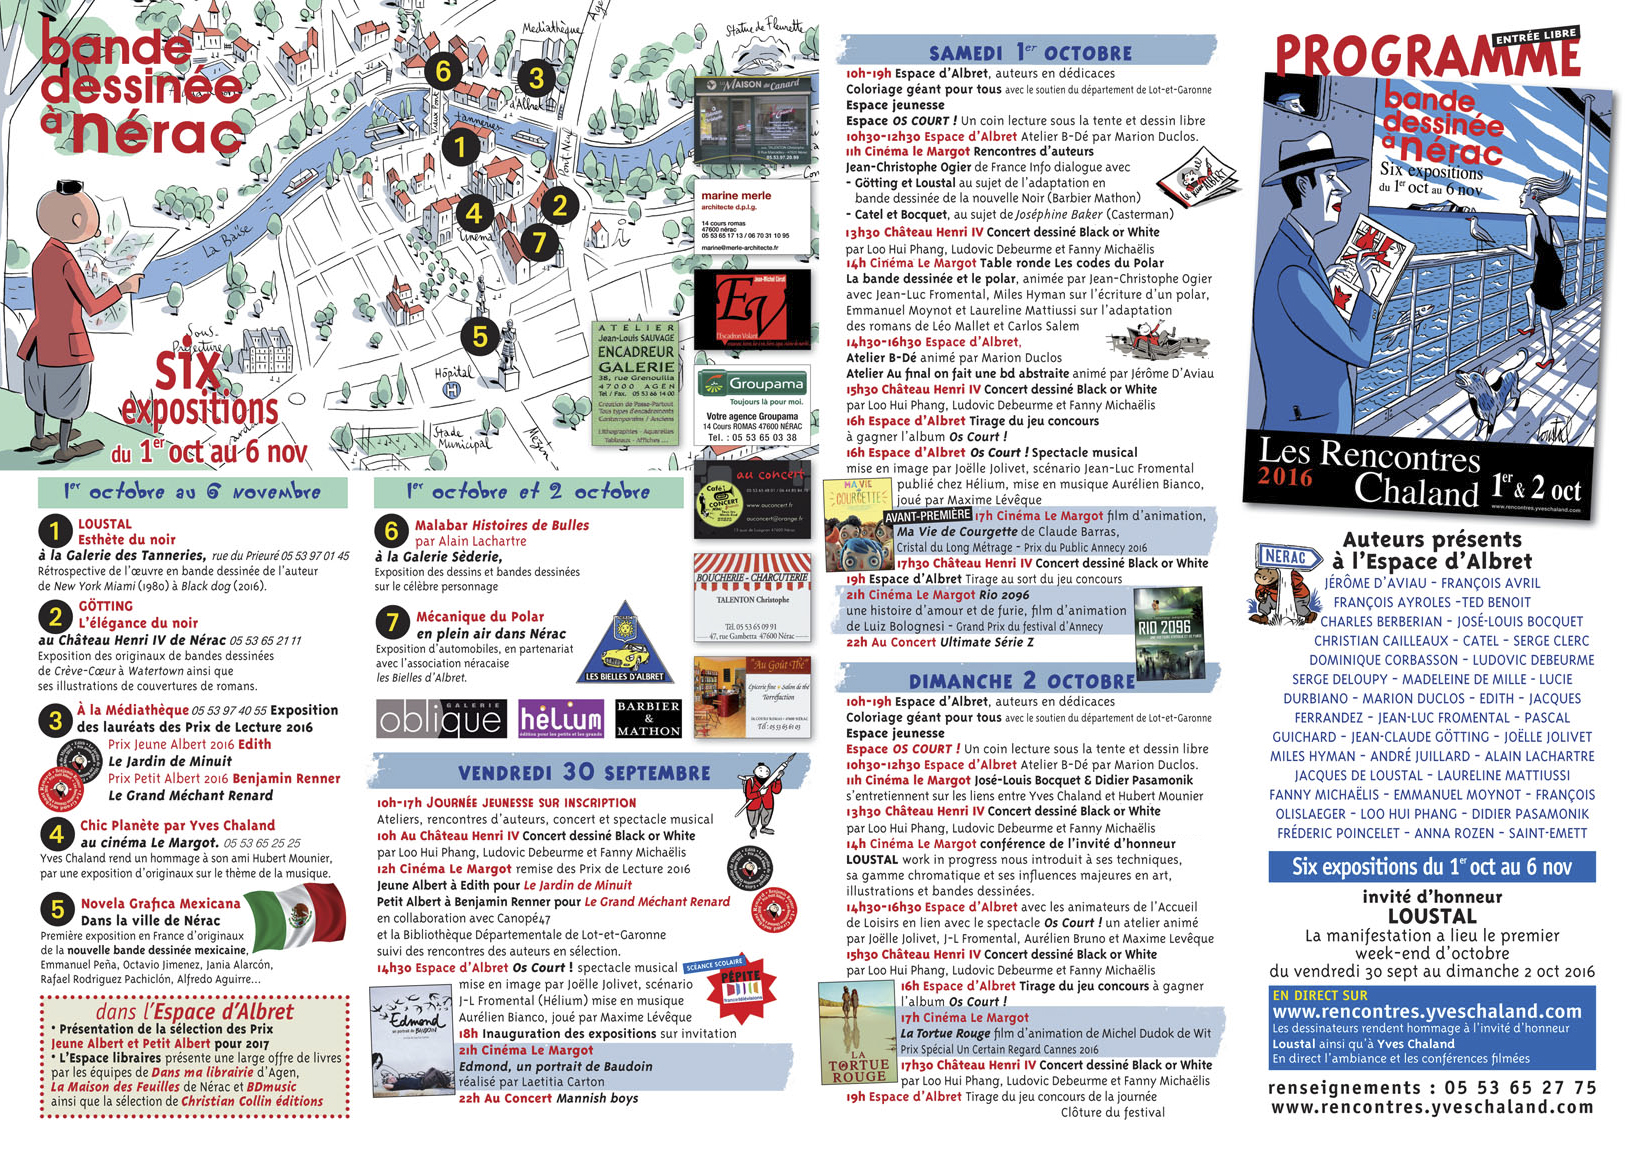 Uoif rencontre 2016 programme